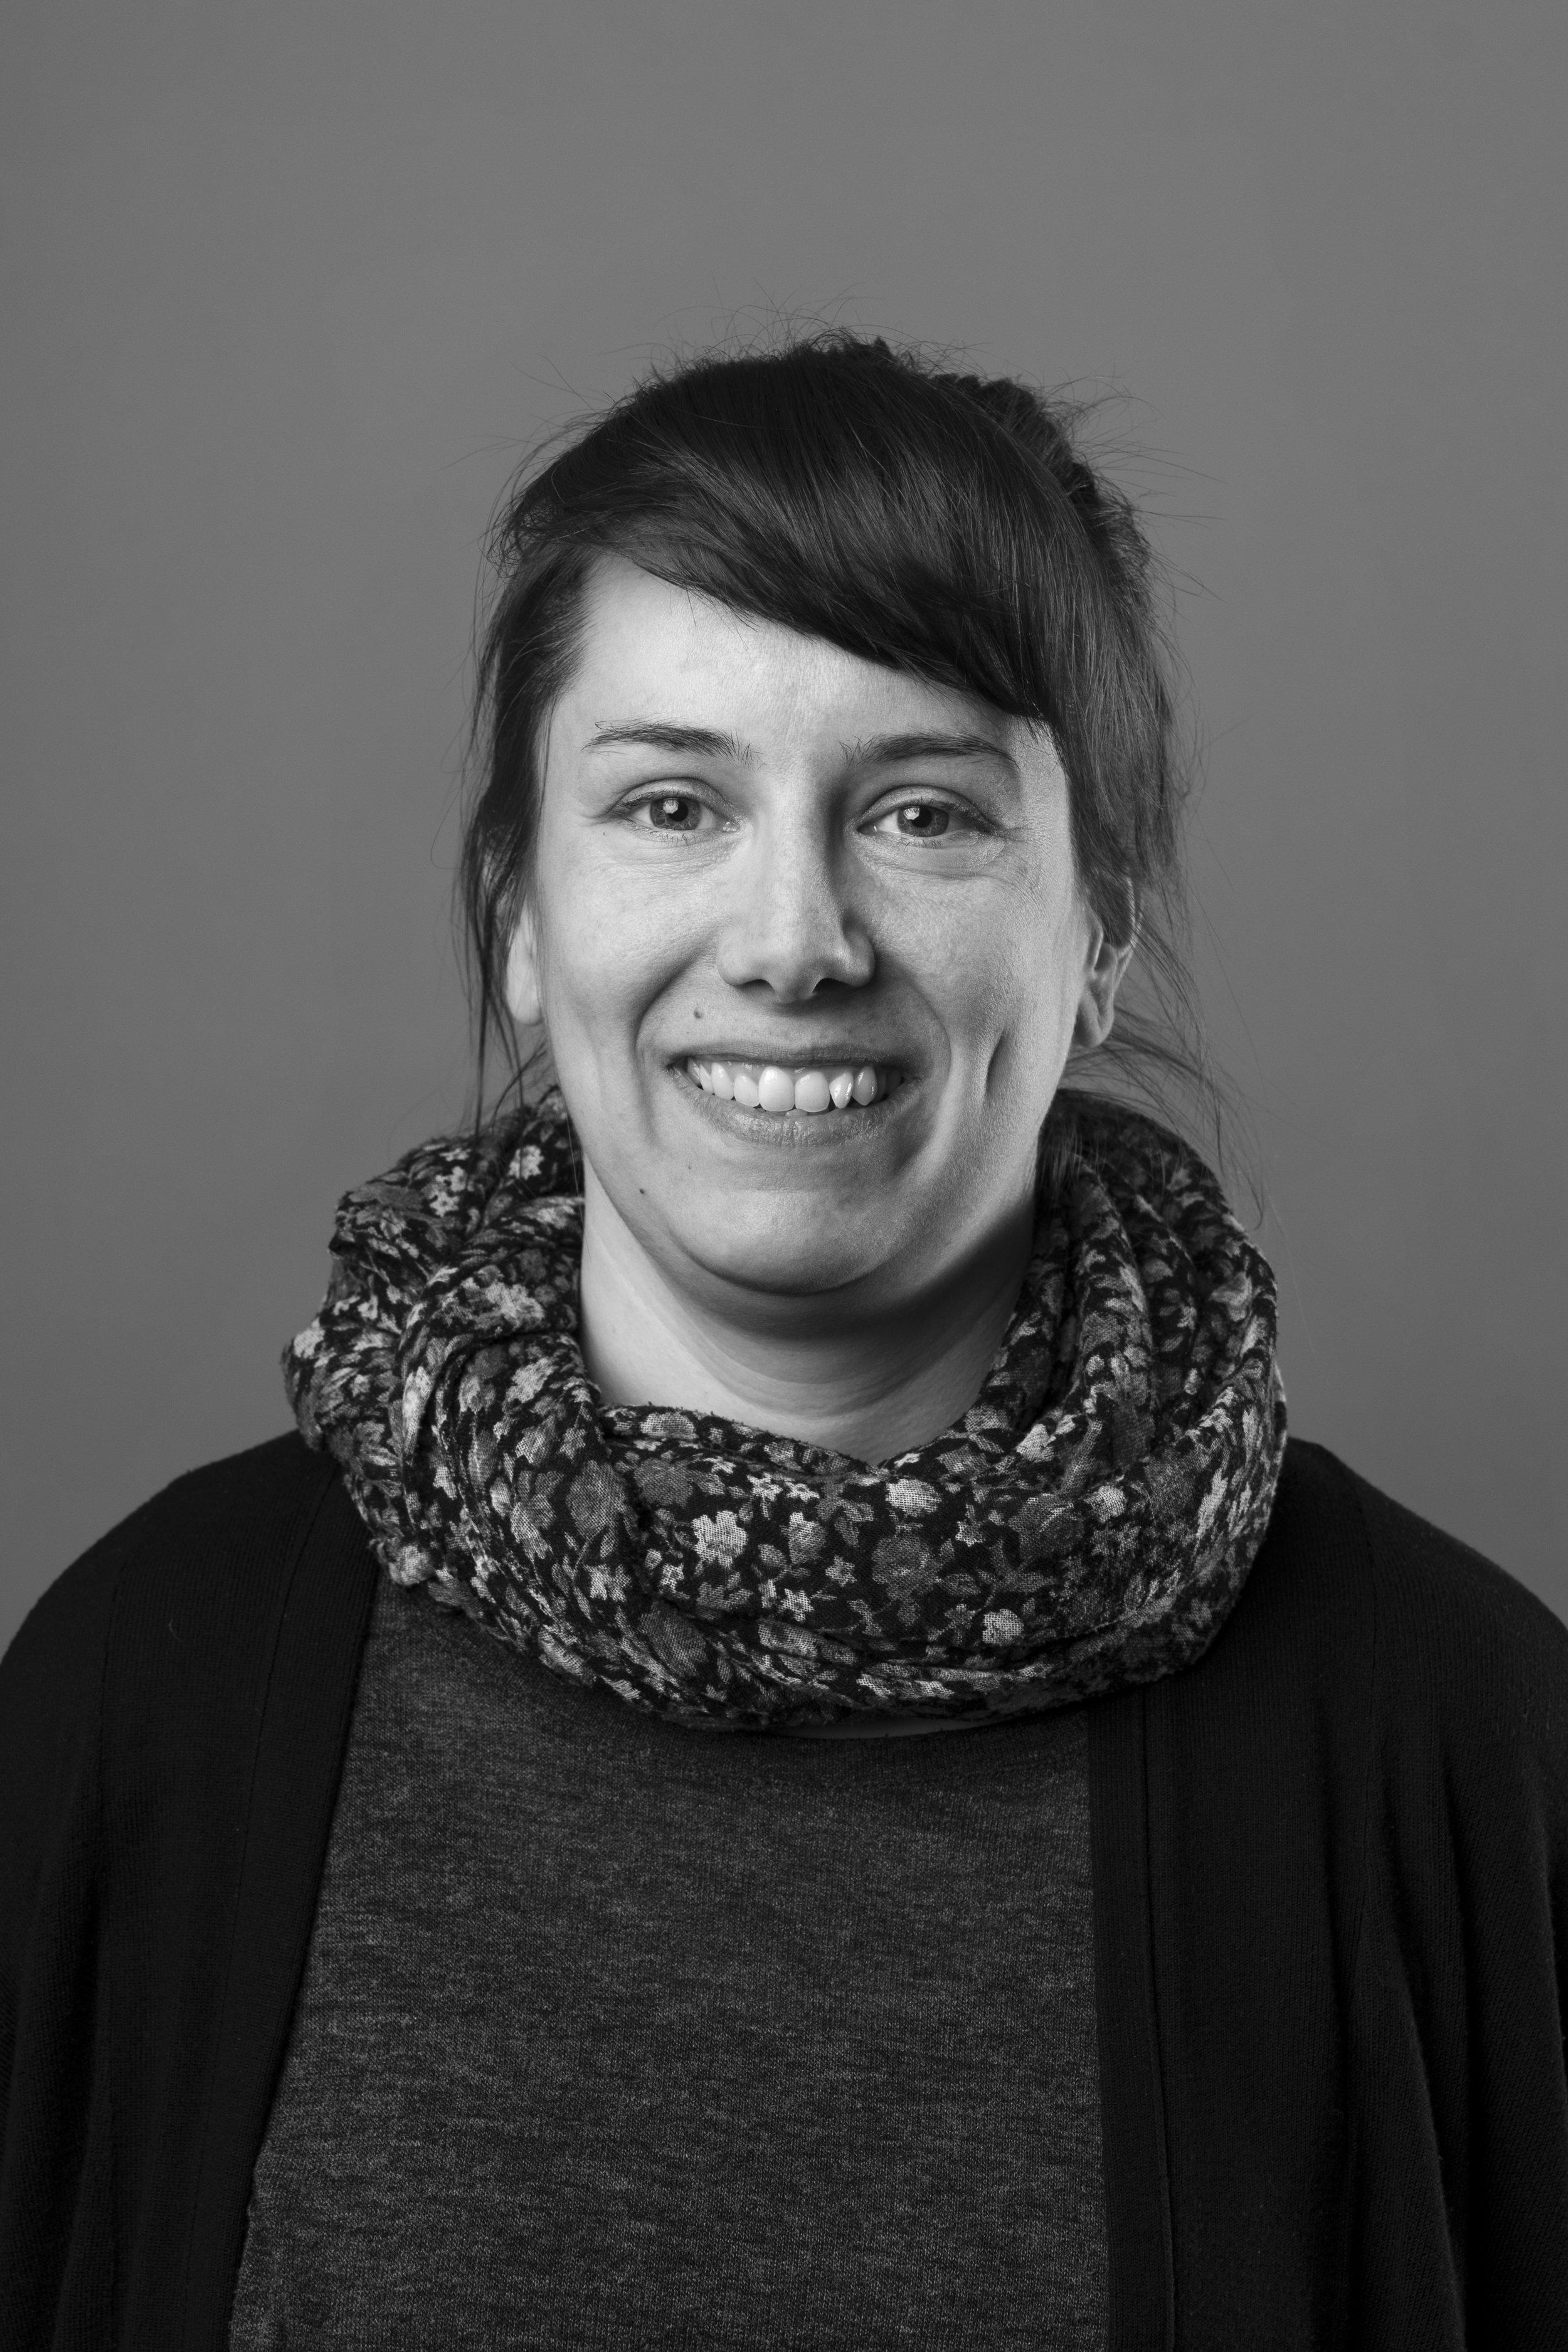 Kristine Harth